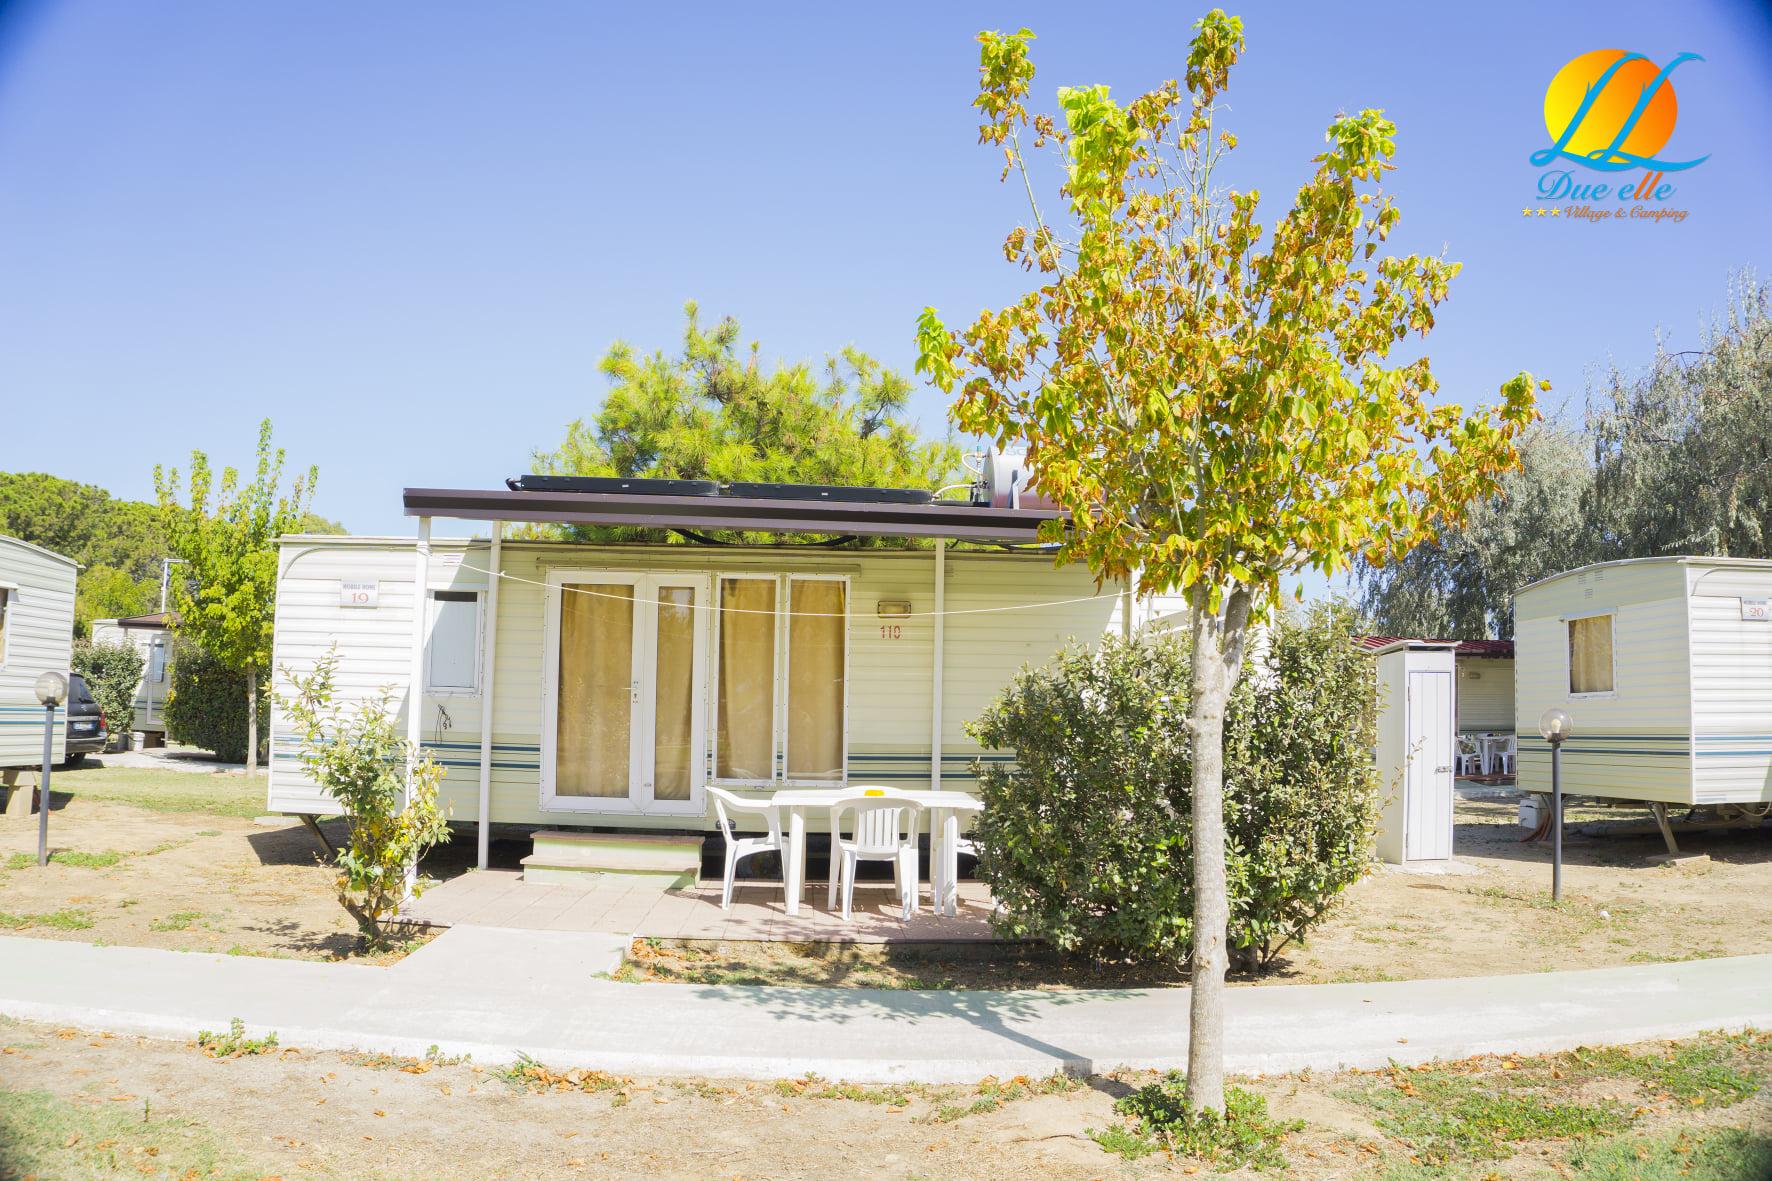 Mobile Home Economy